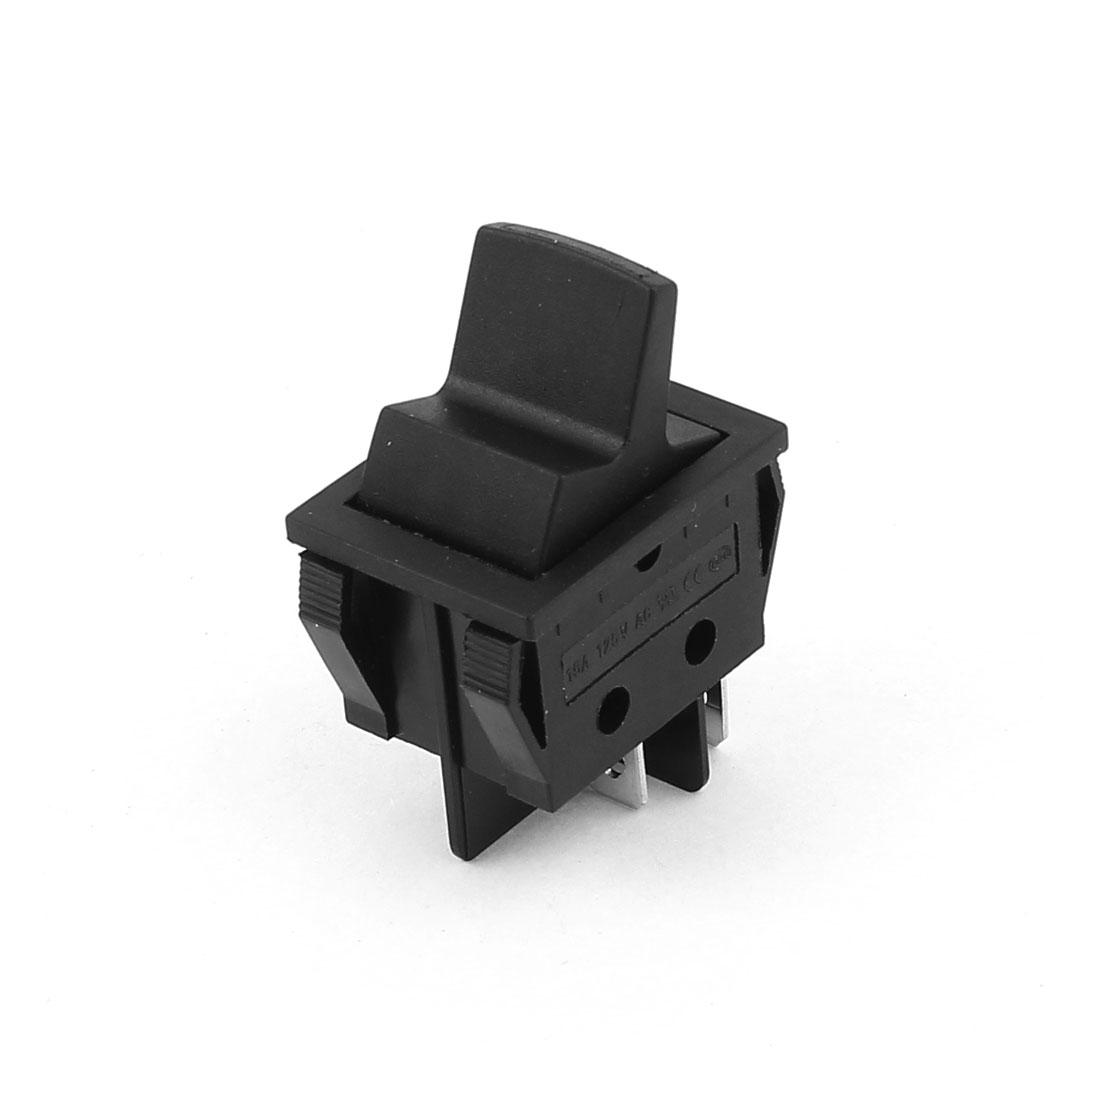 Plastic Casing 4 Terminal Momentary Rocker Switch AC 250V/16(8)A 125V/15A